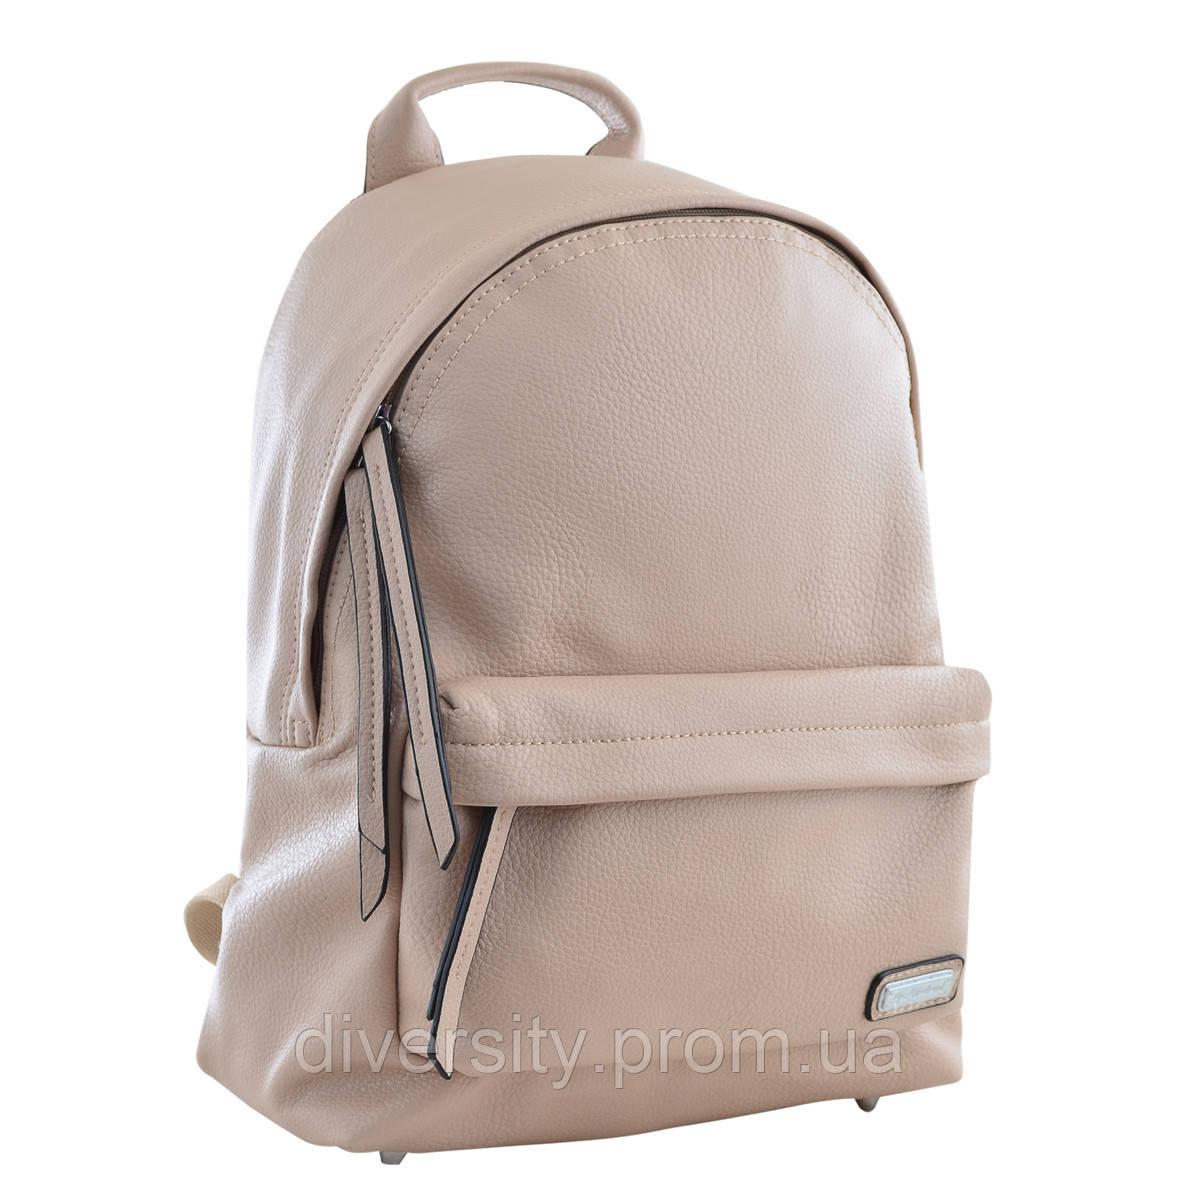 Молодежный рюкзак YES YW-21,  30*38*13,  бежевий